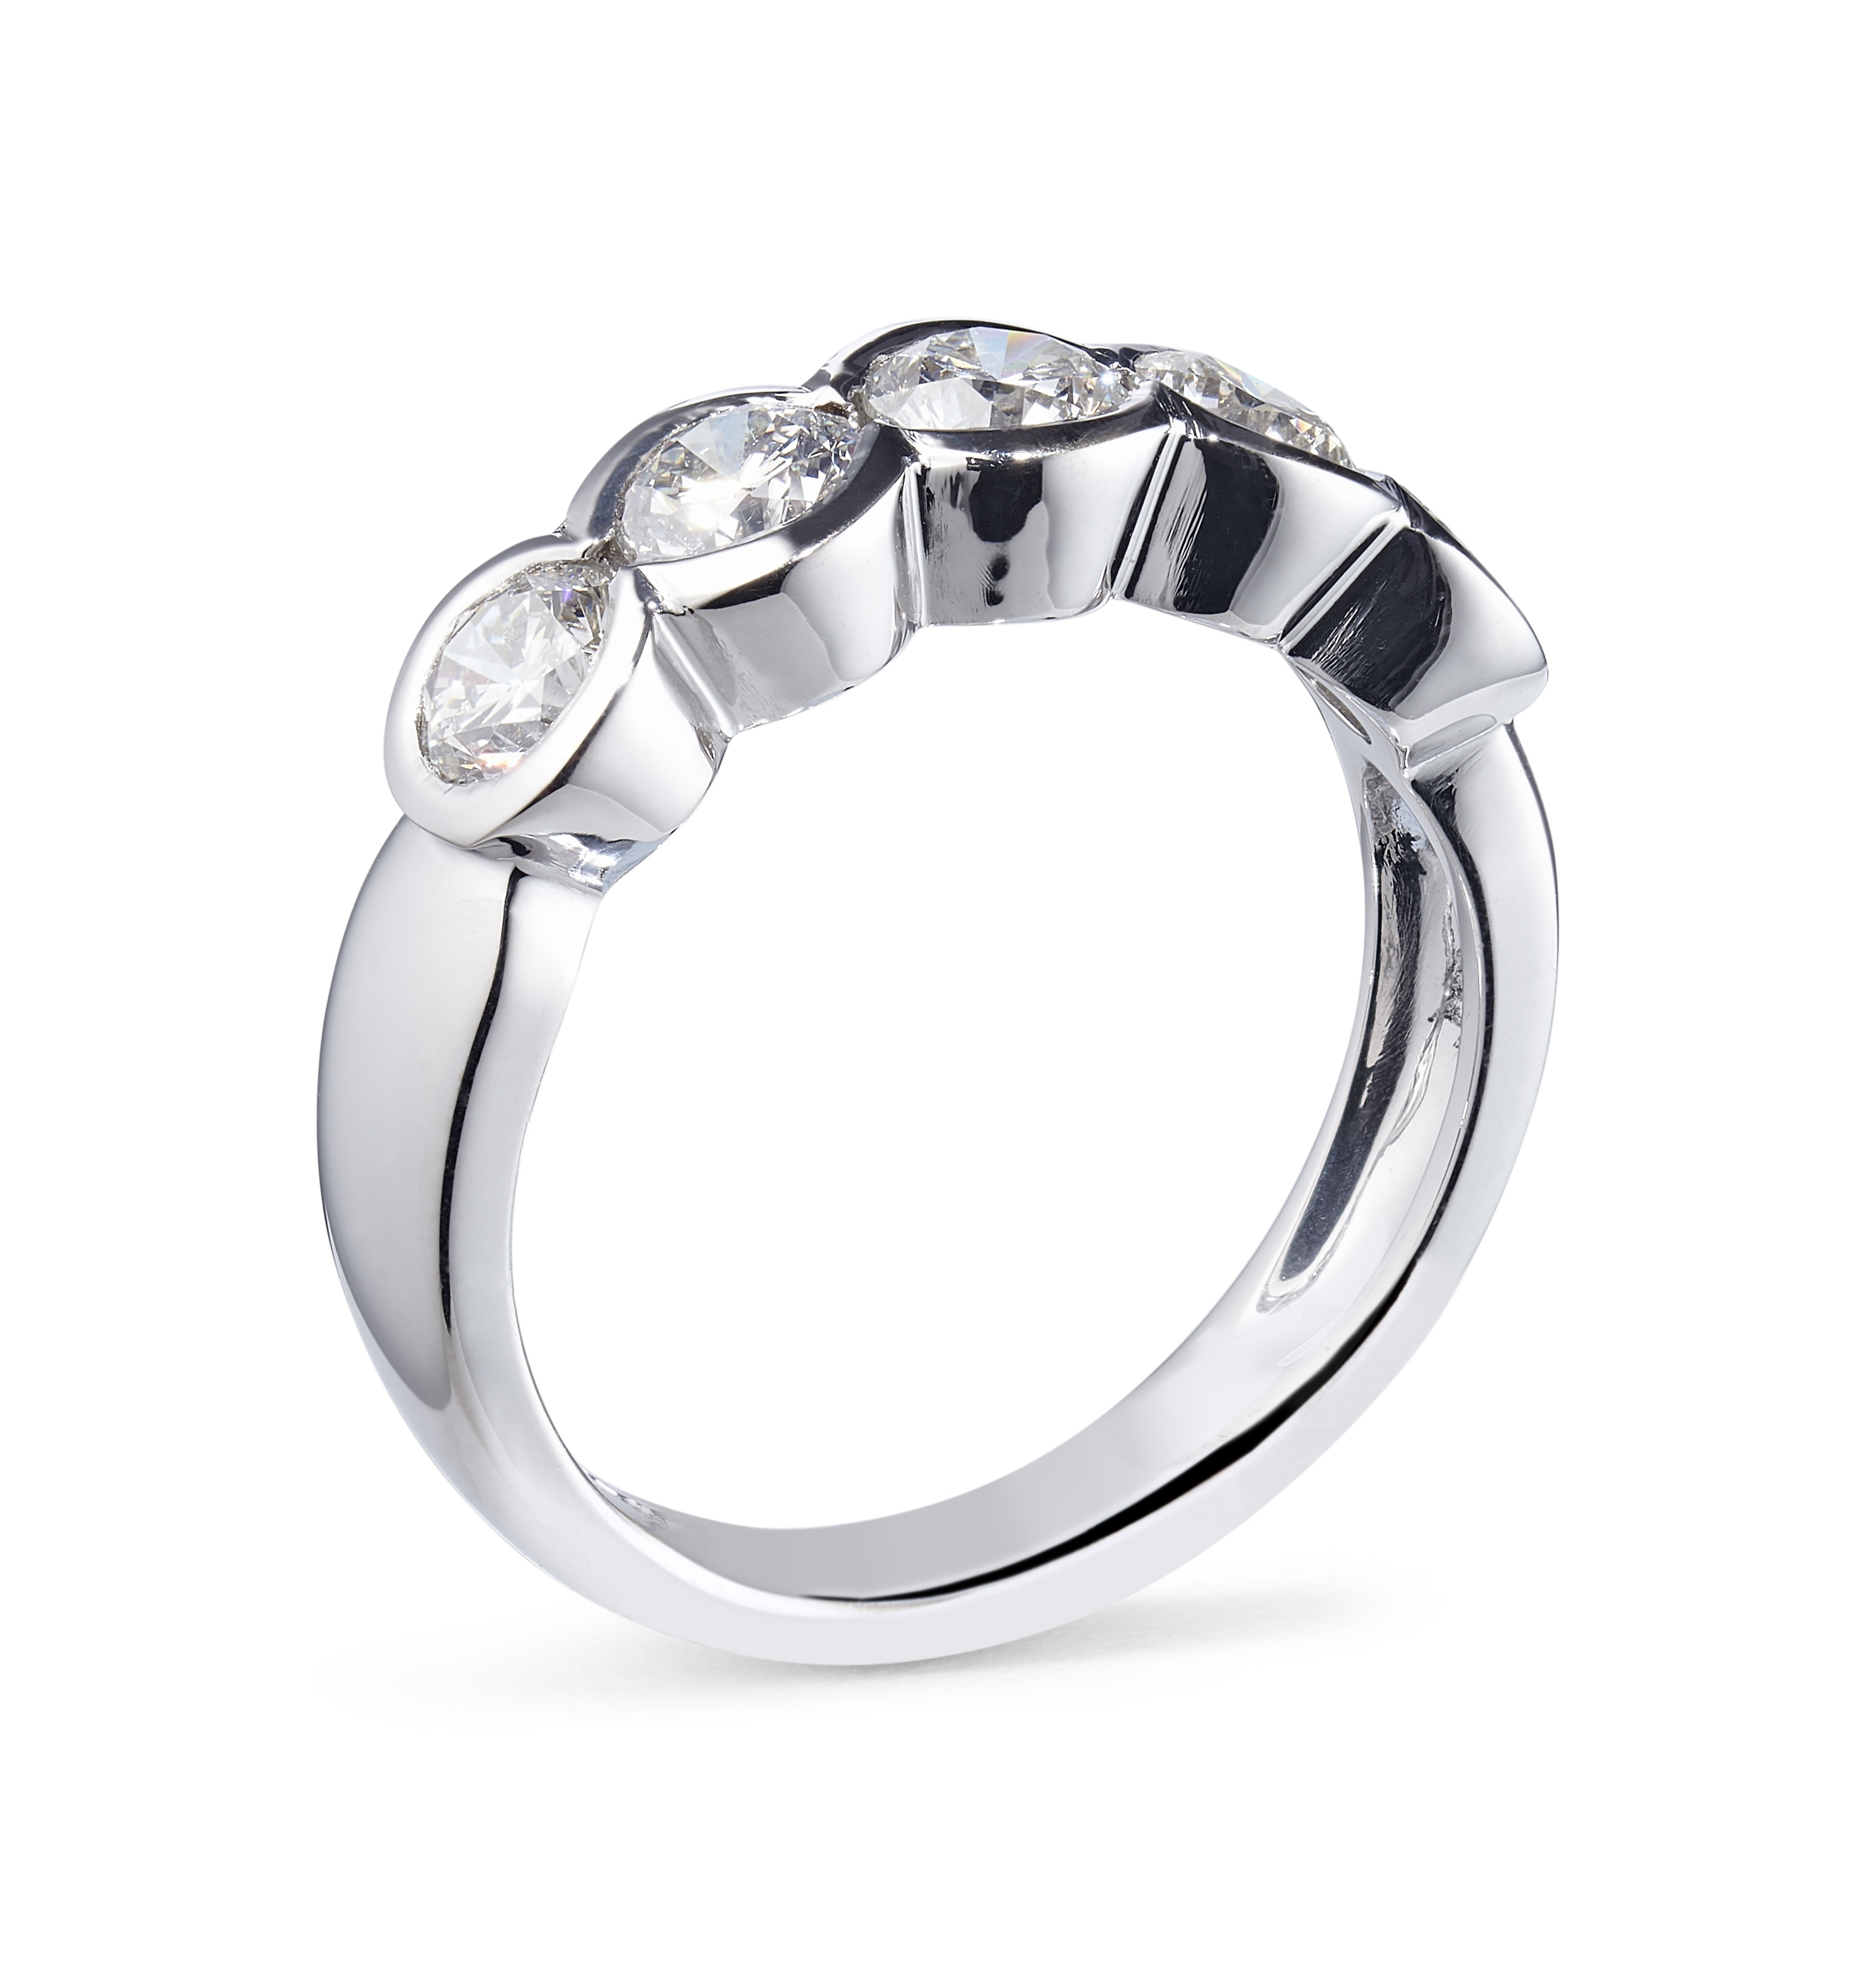 1.35ct 18ct White Gold 5 Stone Rubover Diamond Ring